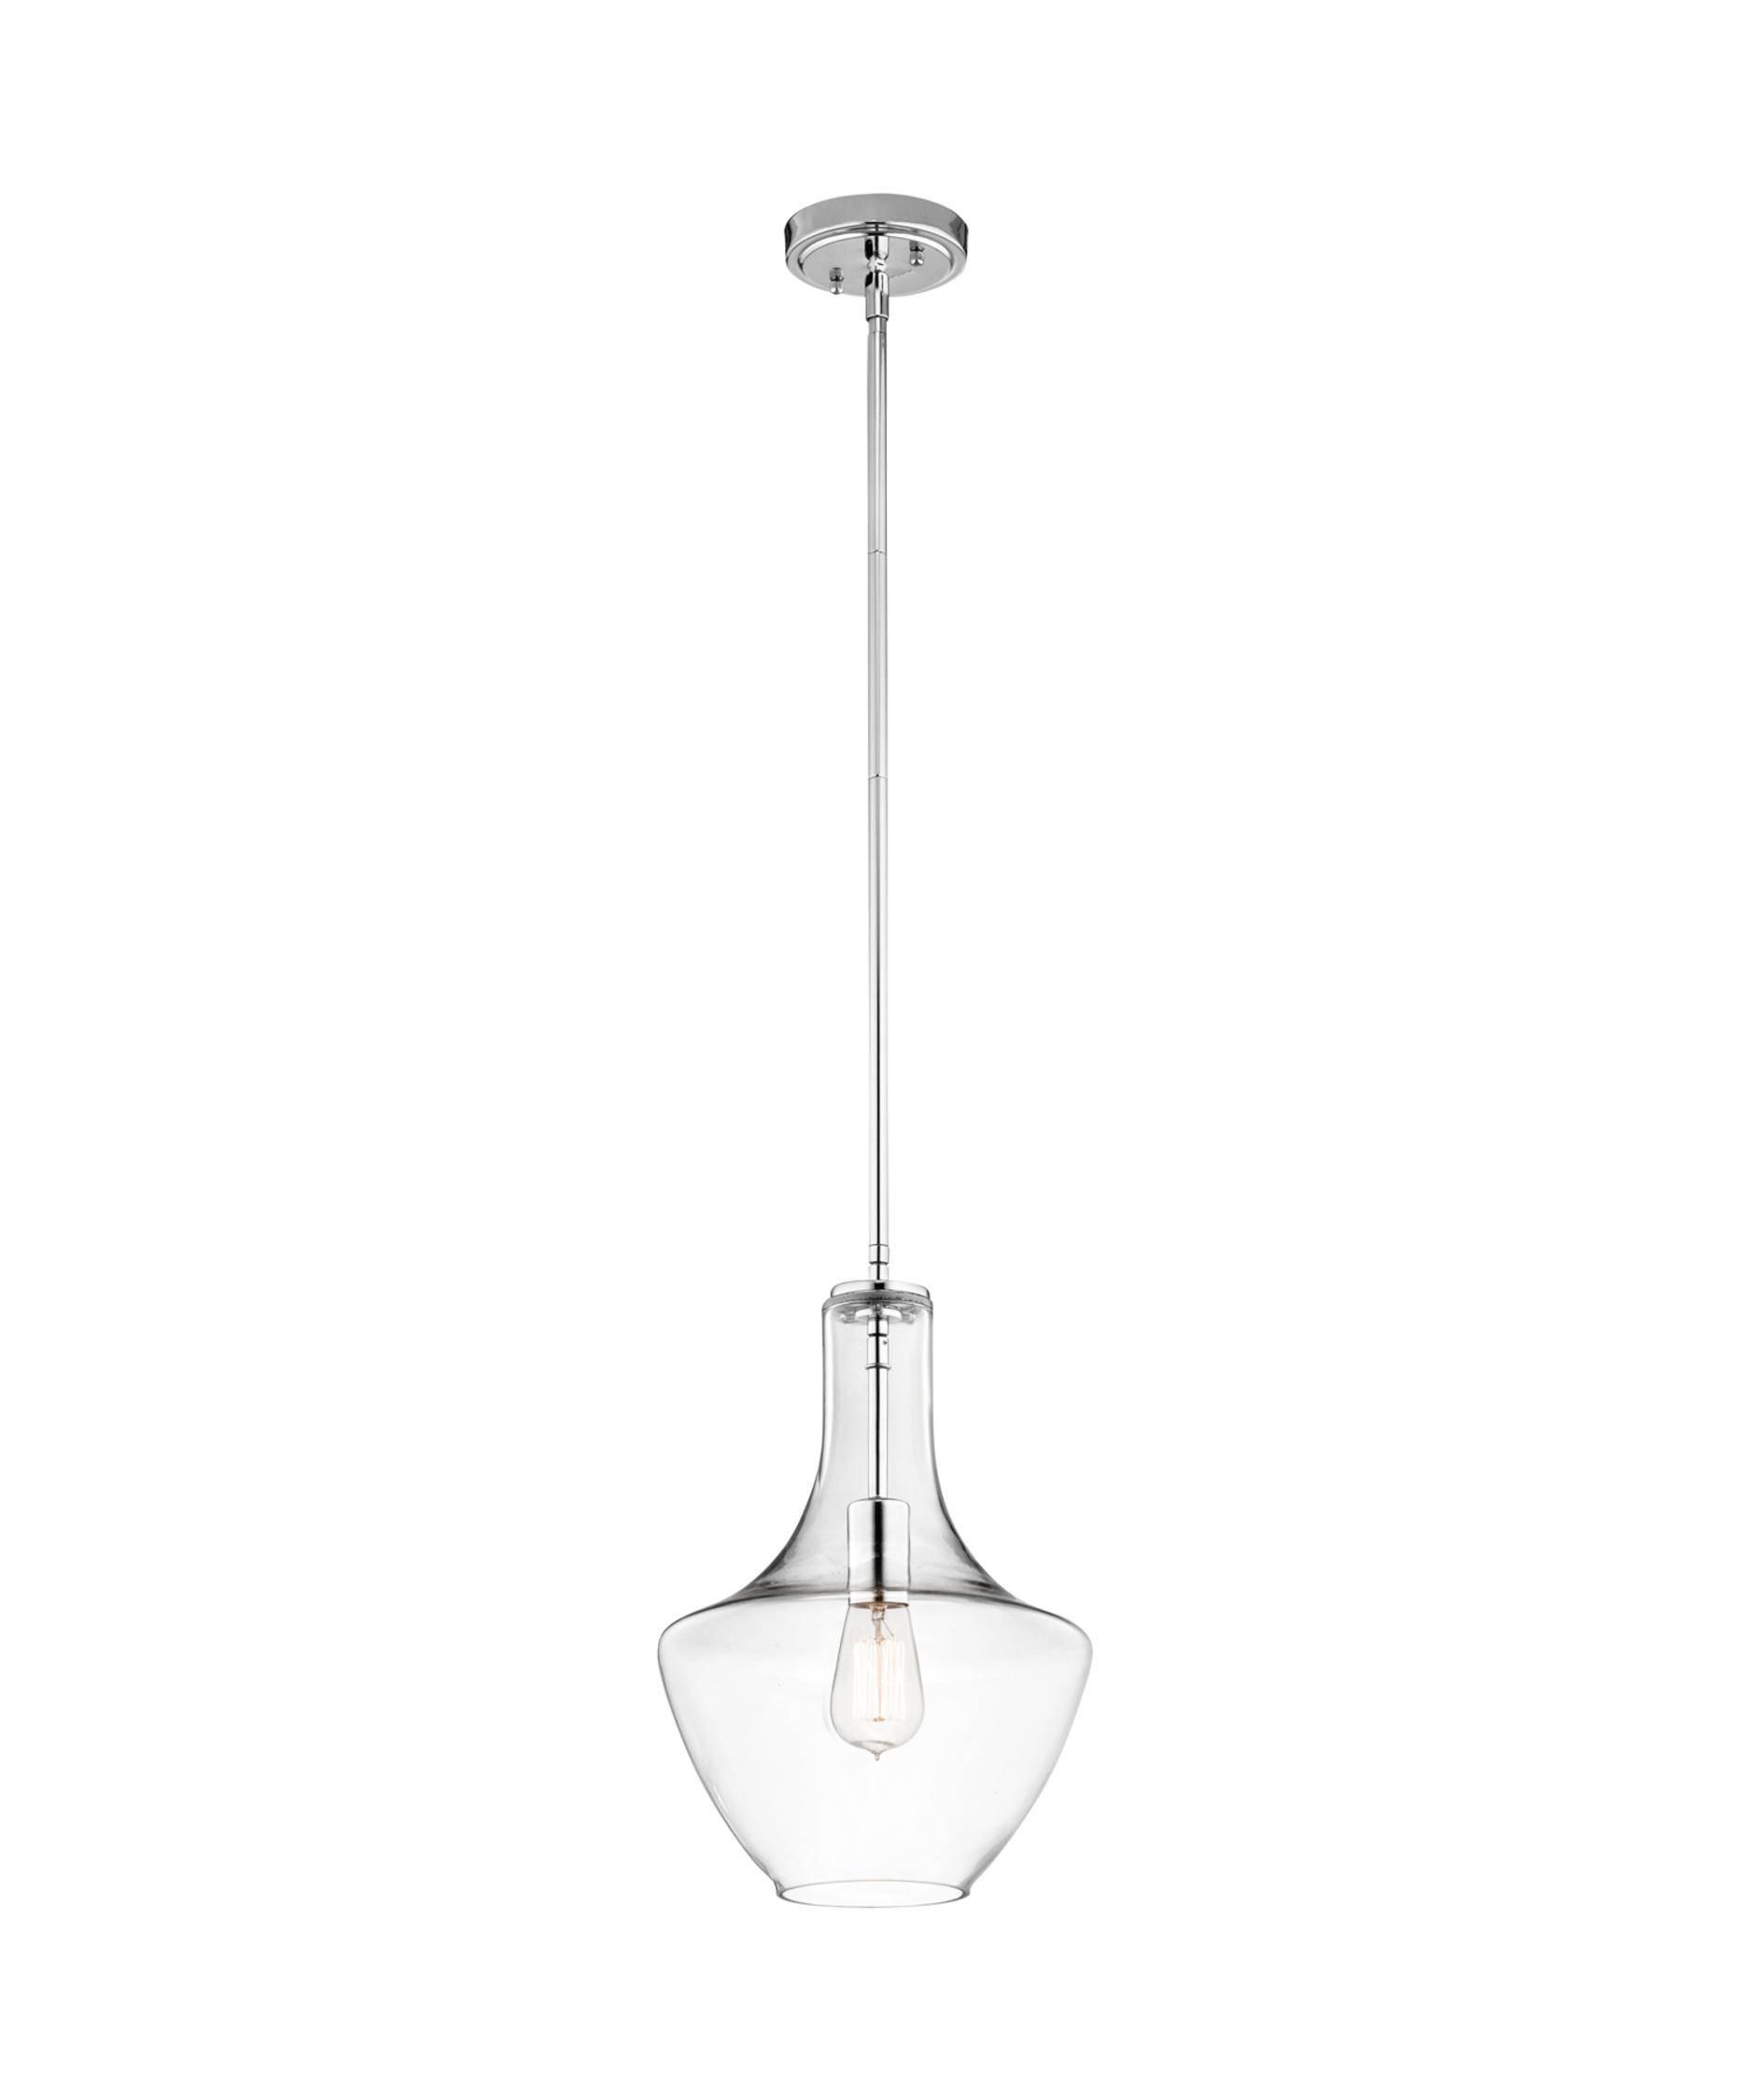 Kichler 42141 Everly 11 Inch Wide 1 Light Mini Pendant | Capitol For Kichler Mini Pendant Lights (View 10 of 15)